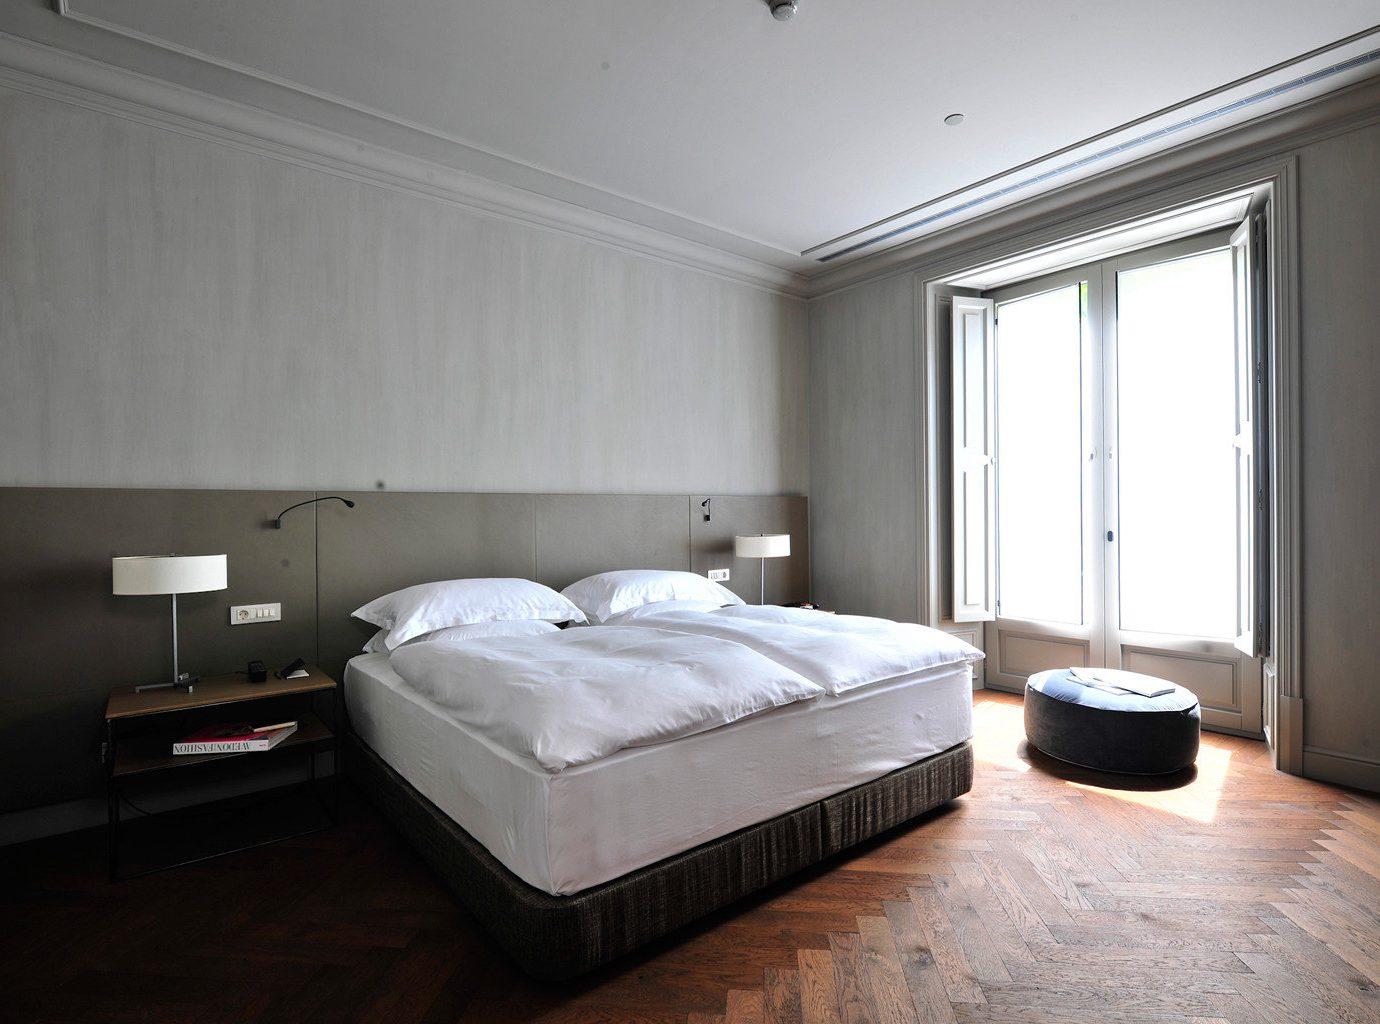 Bedroom City Hip Luxury Modern property home Suite living room bed frame